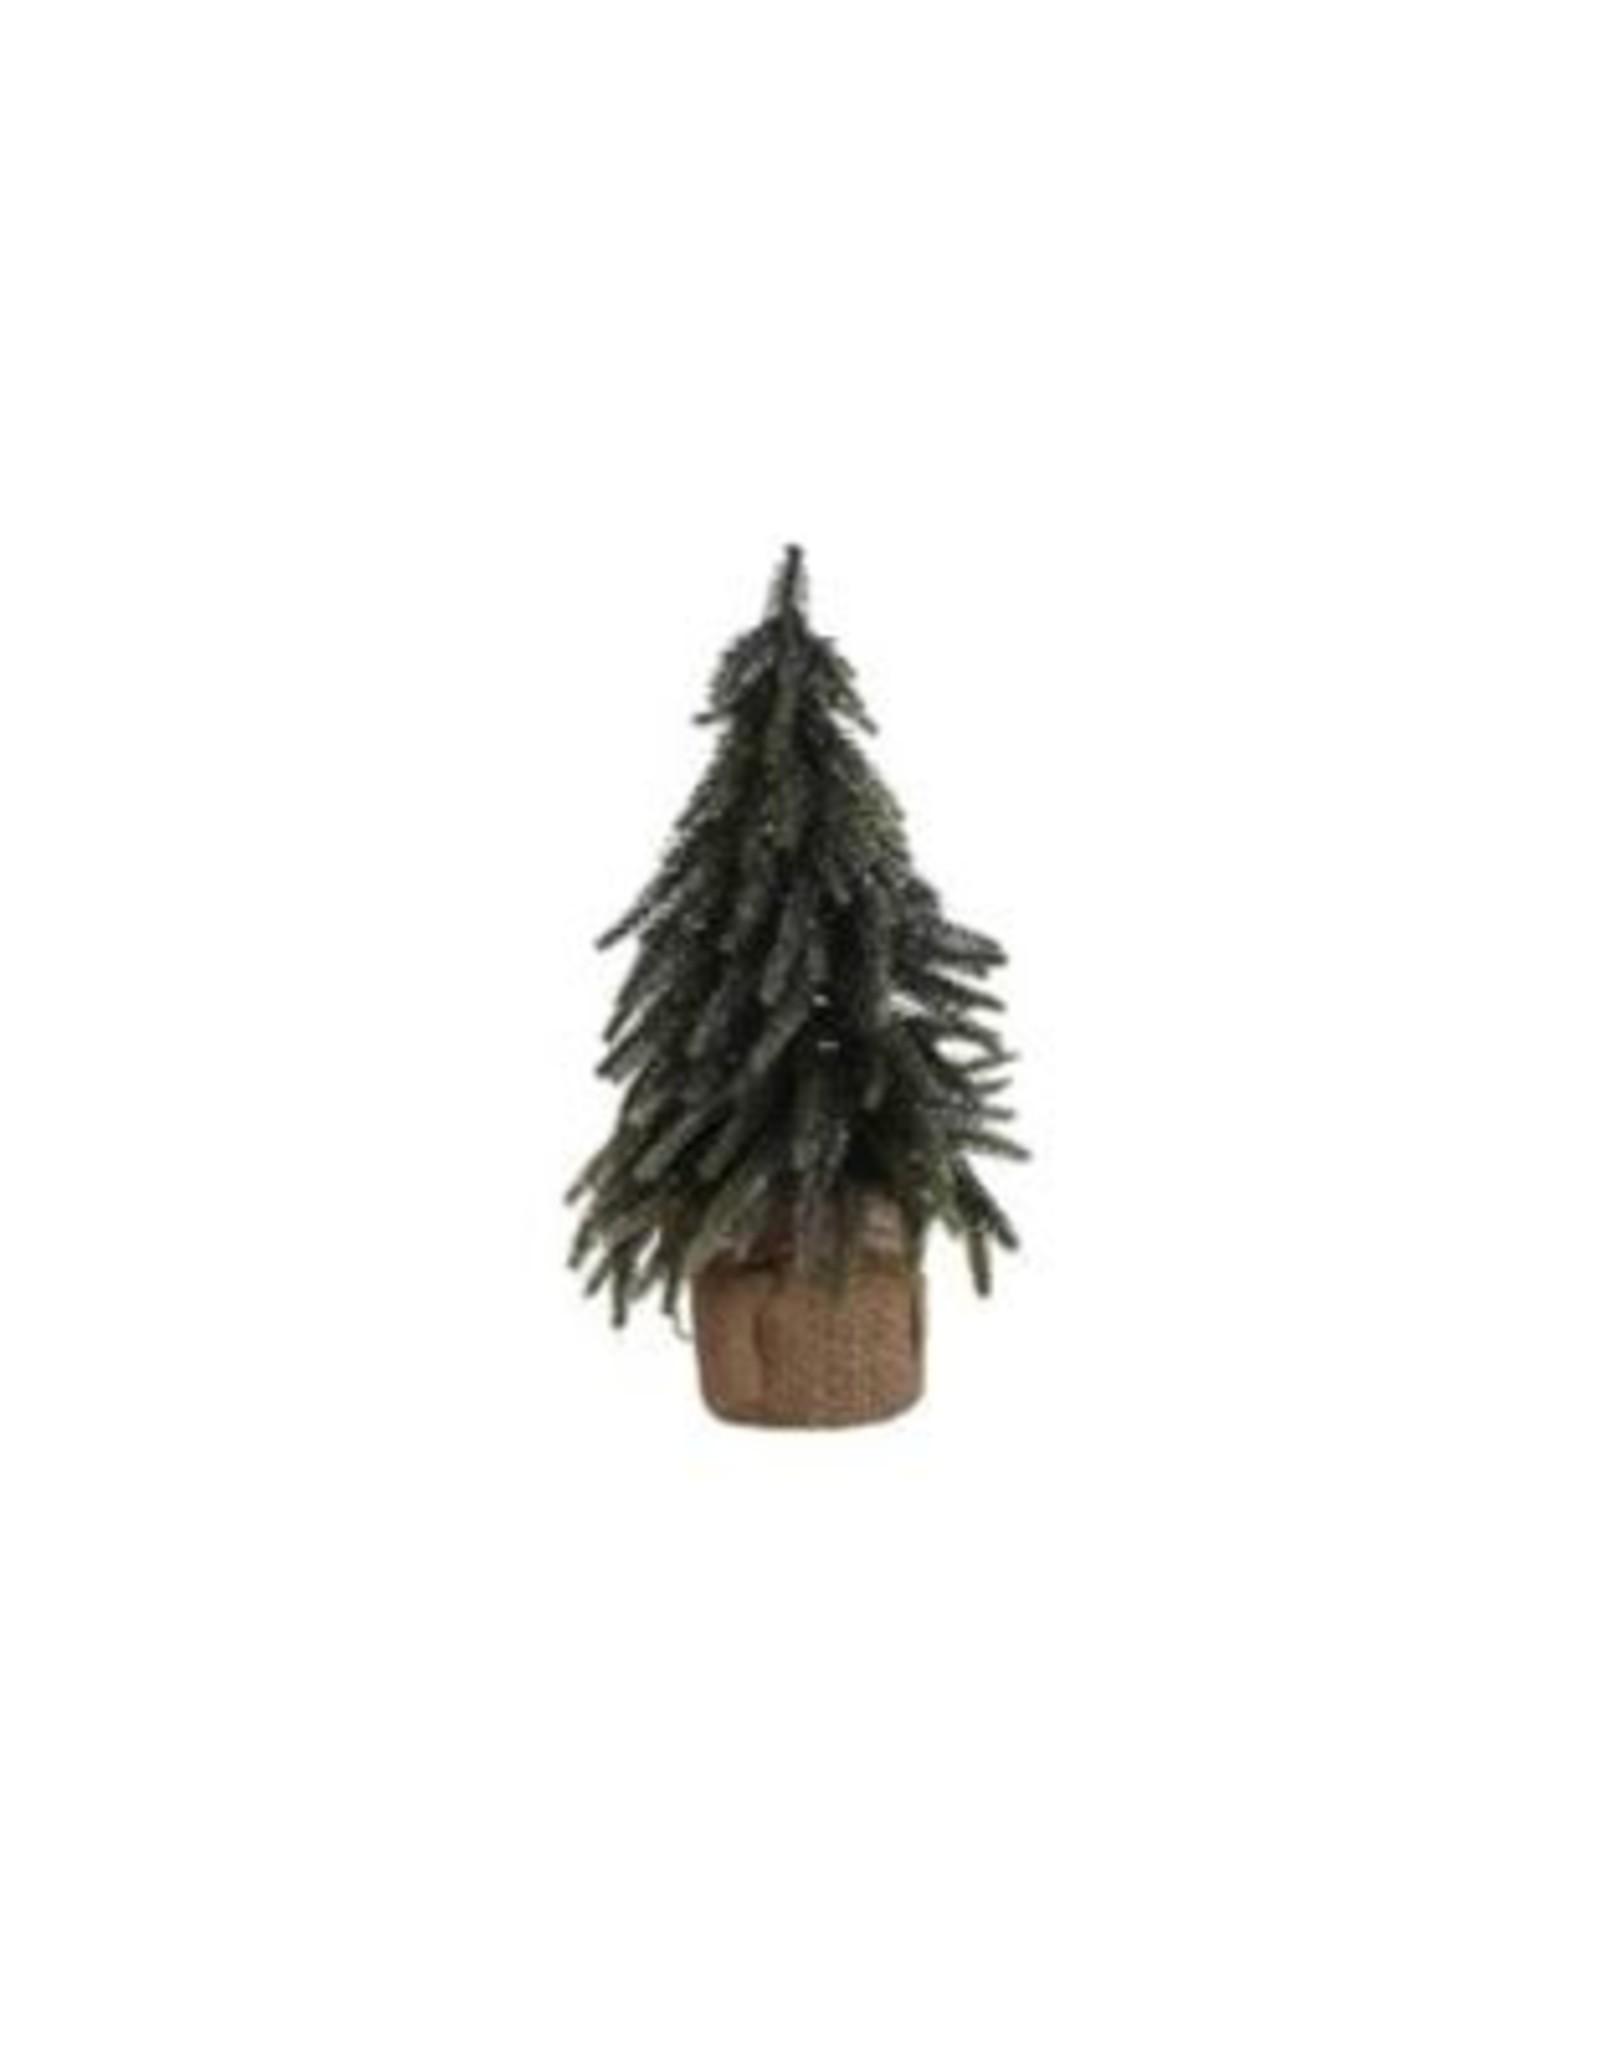 X-Mas Tree Green Glitter Silver with Burlap - 11-3/4''H